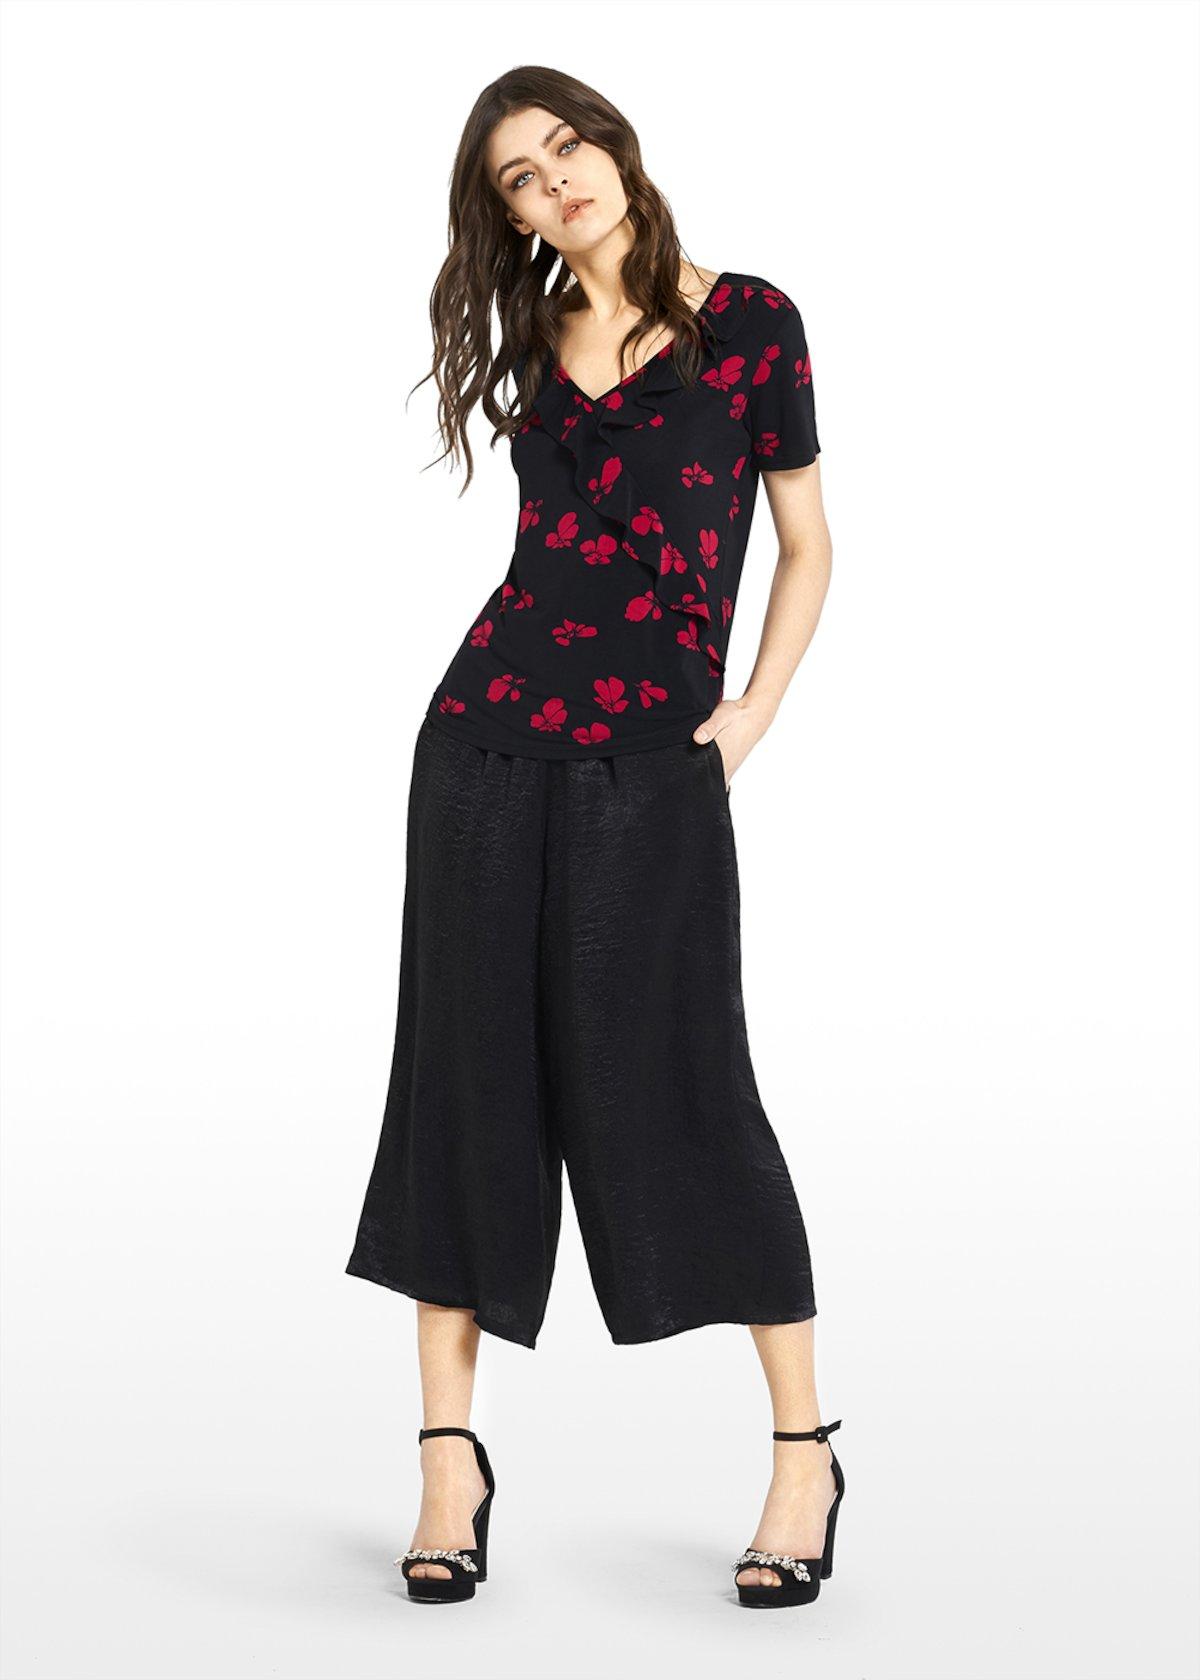 T-shirt Salek in jersey micro-flowers print - Black\ Tulipano\ Fantasia - Donna